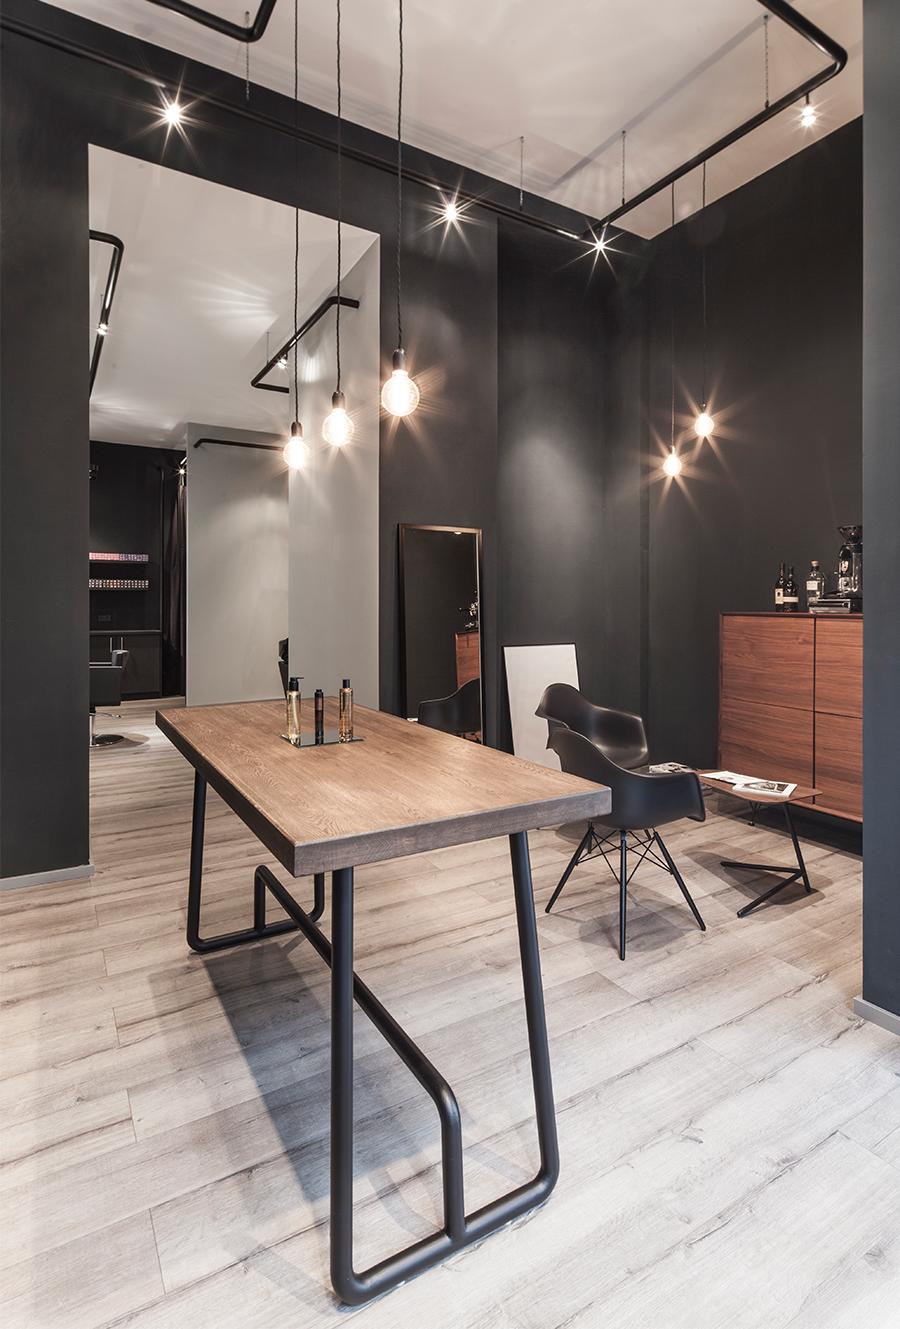 Bailas contemporary coiffure interior design on behance for Hillen interieur